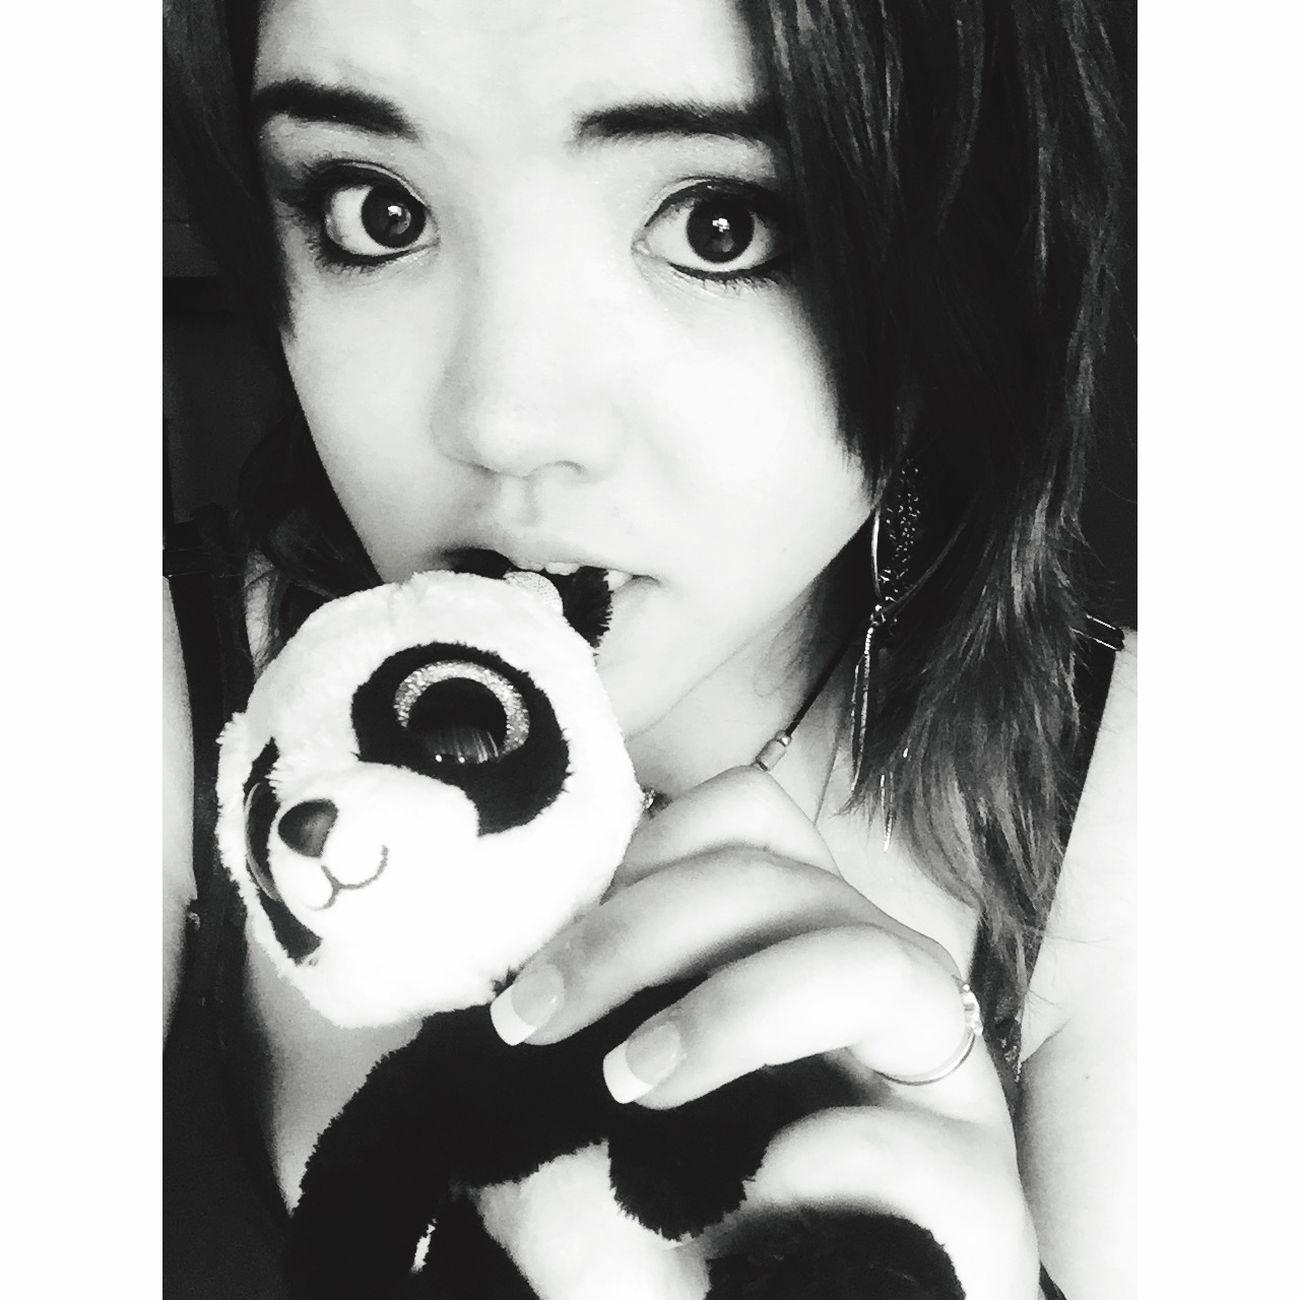 PANDA ♡♡ Blackandwhite Photography Selfie ✌ MeMyselfAndI ♡ Cute♡